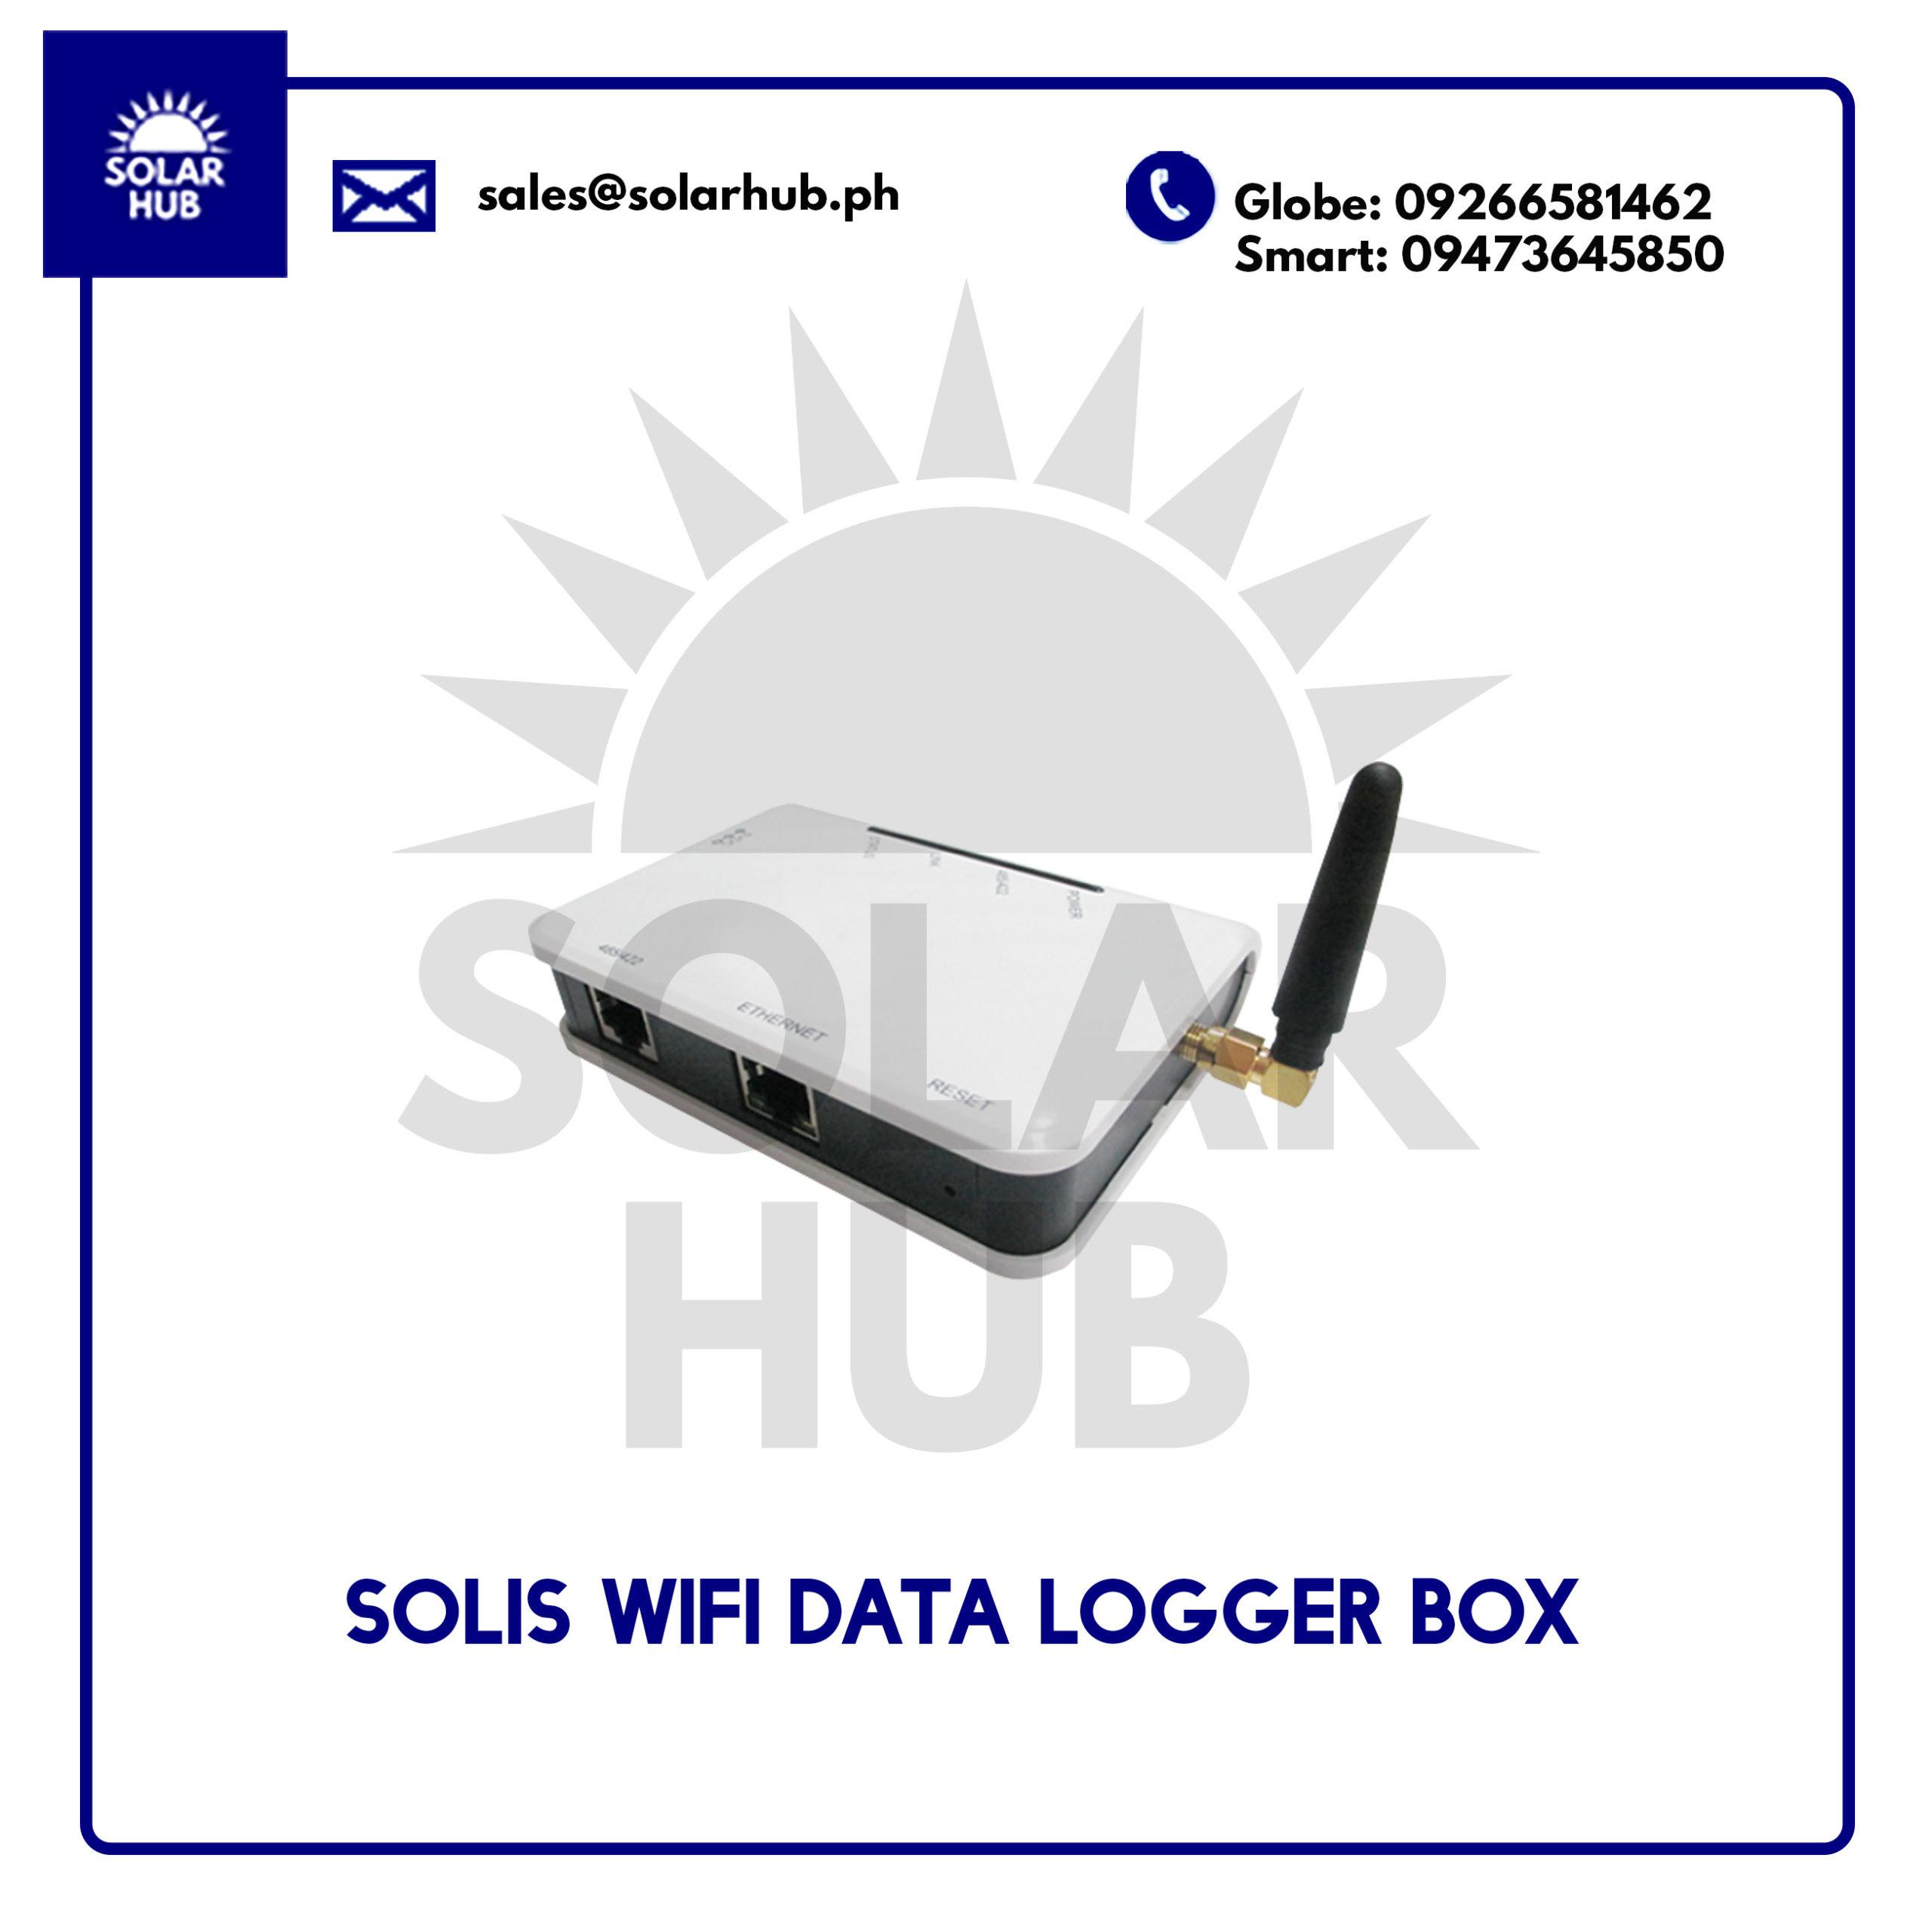 Solis Wifi Data Logger Box